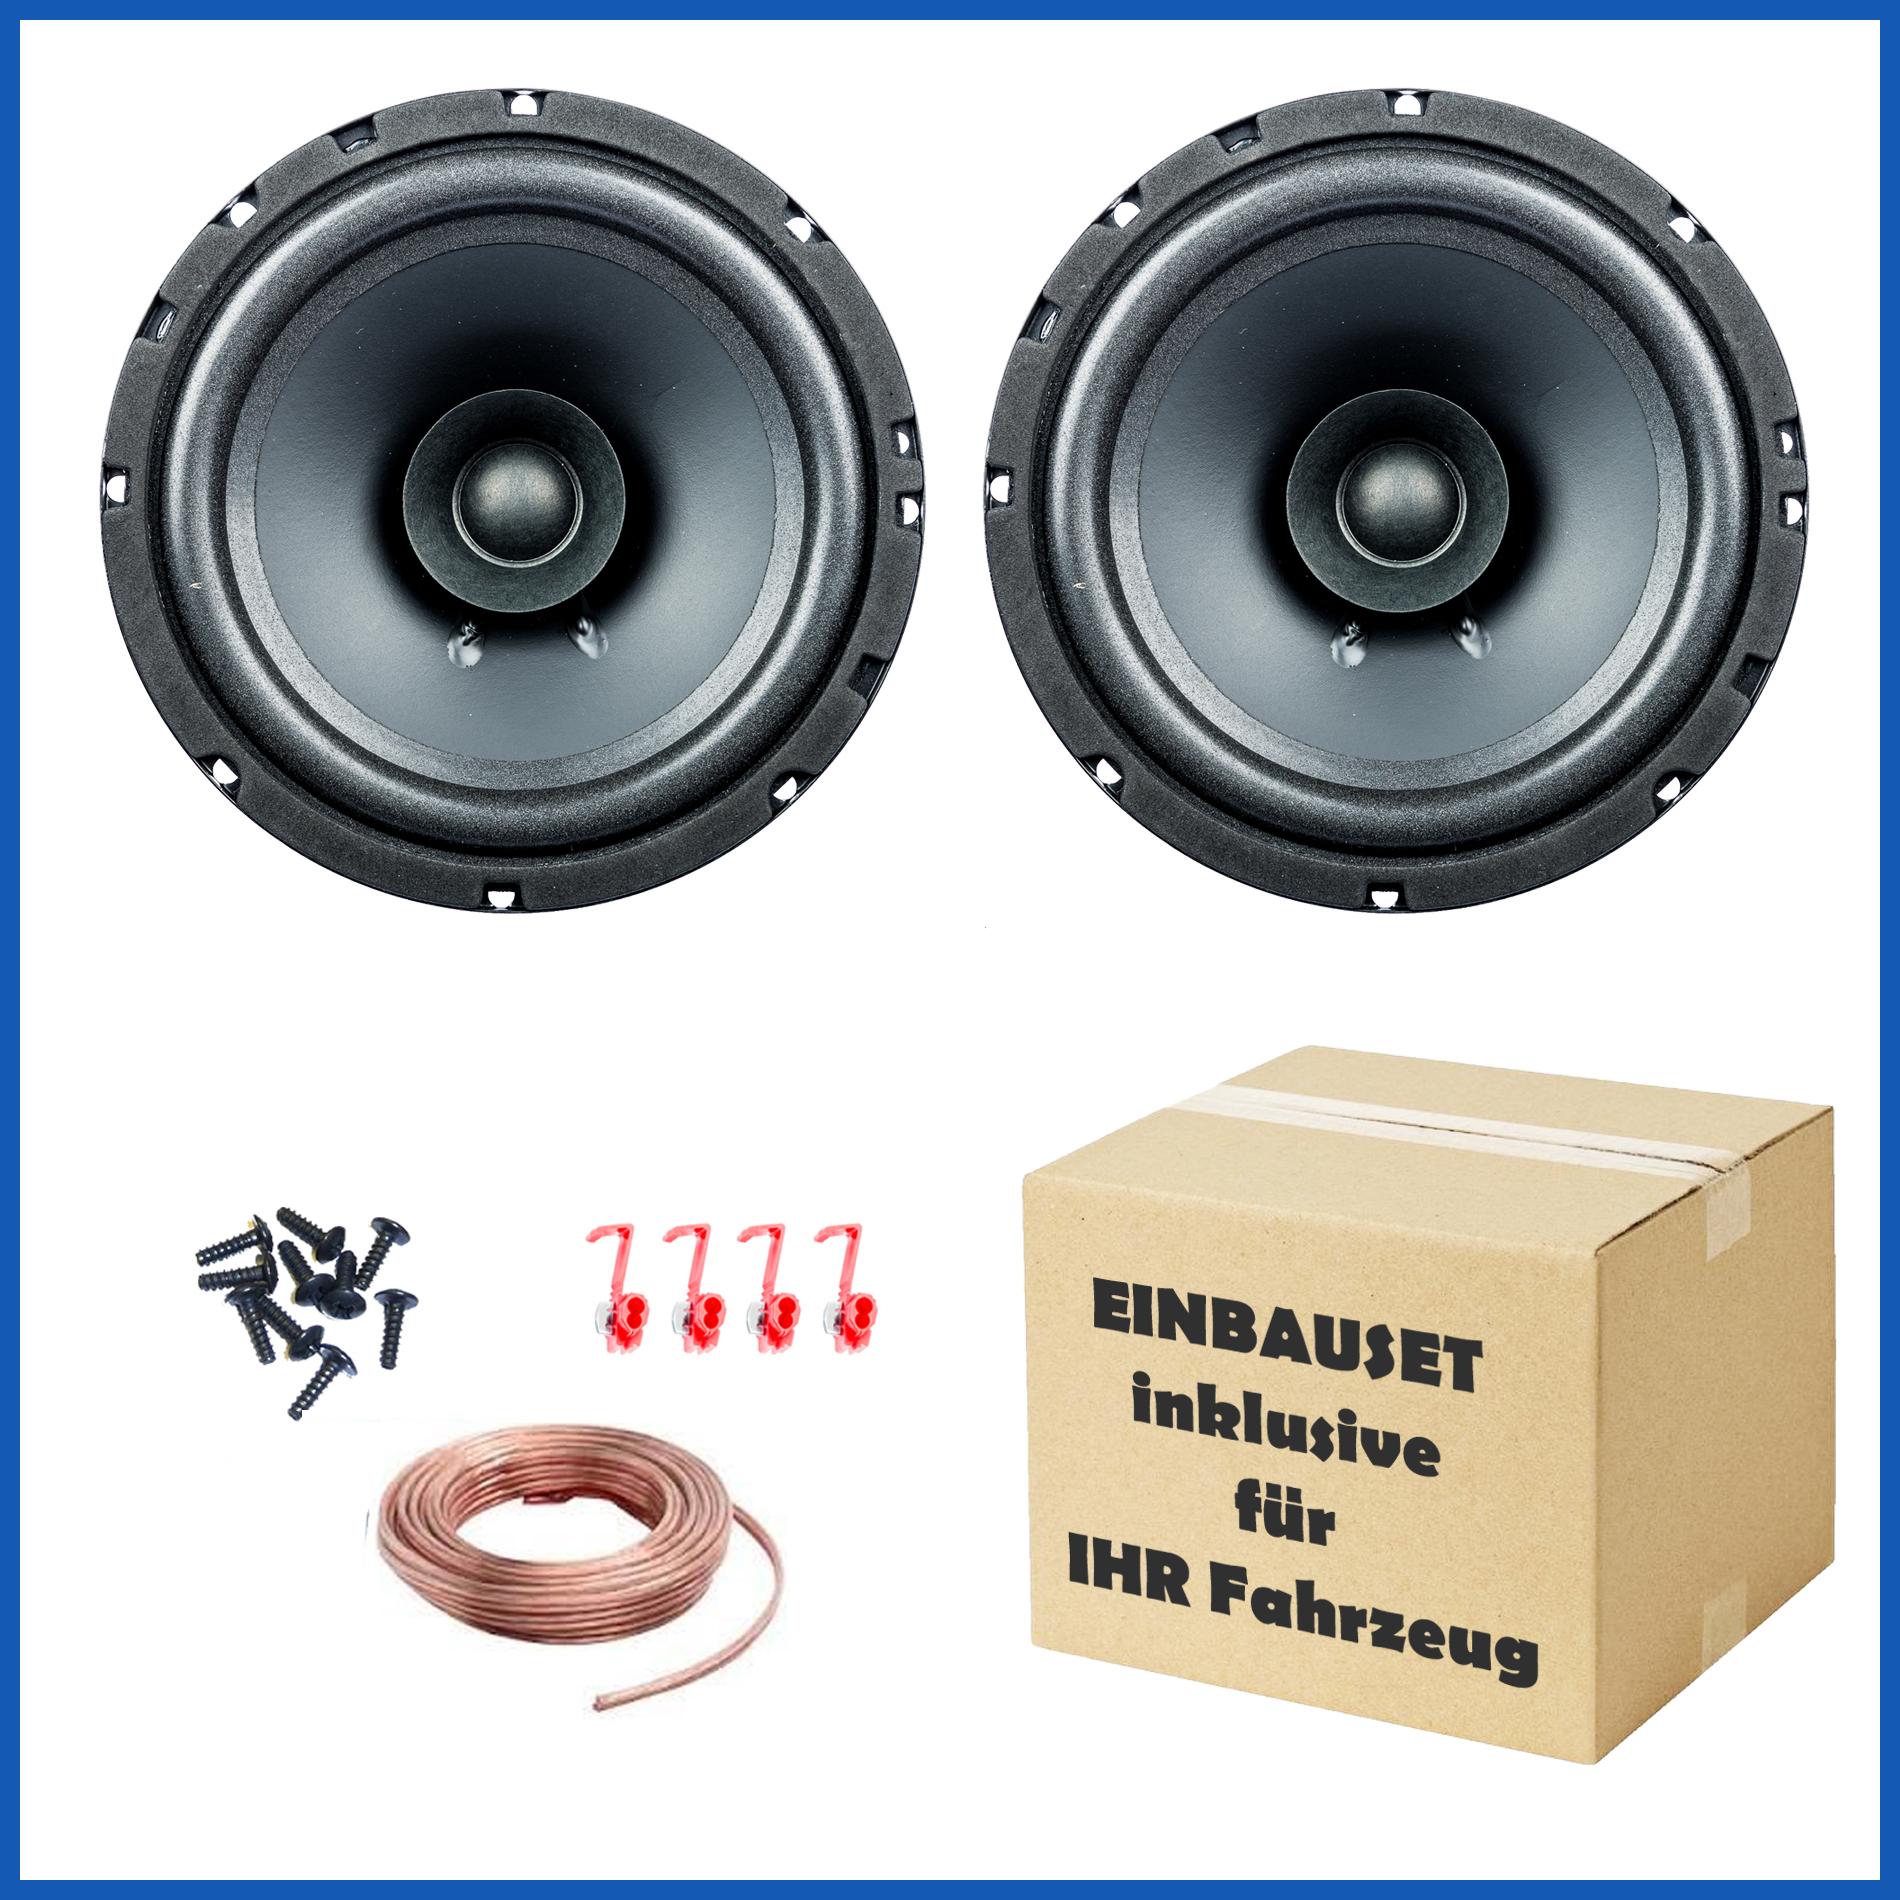 1 Paar PG Audio EVO I 16.2, 16 cm Dual Cone Lautsprecher für Citröen,Peugeot,Renault,Jaguar & Dodge